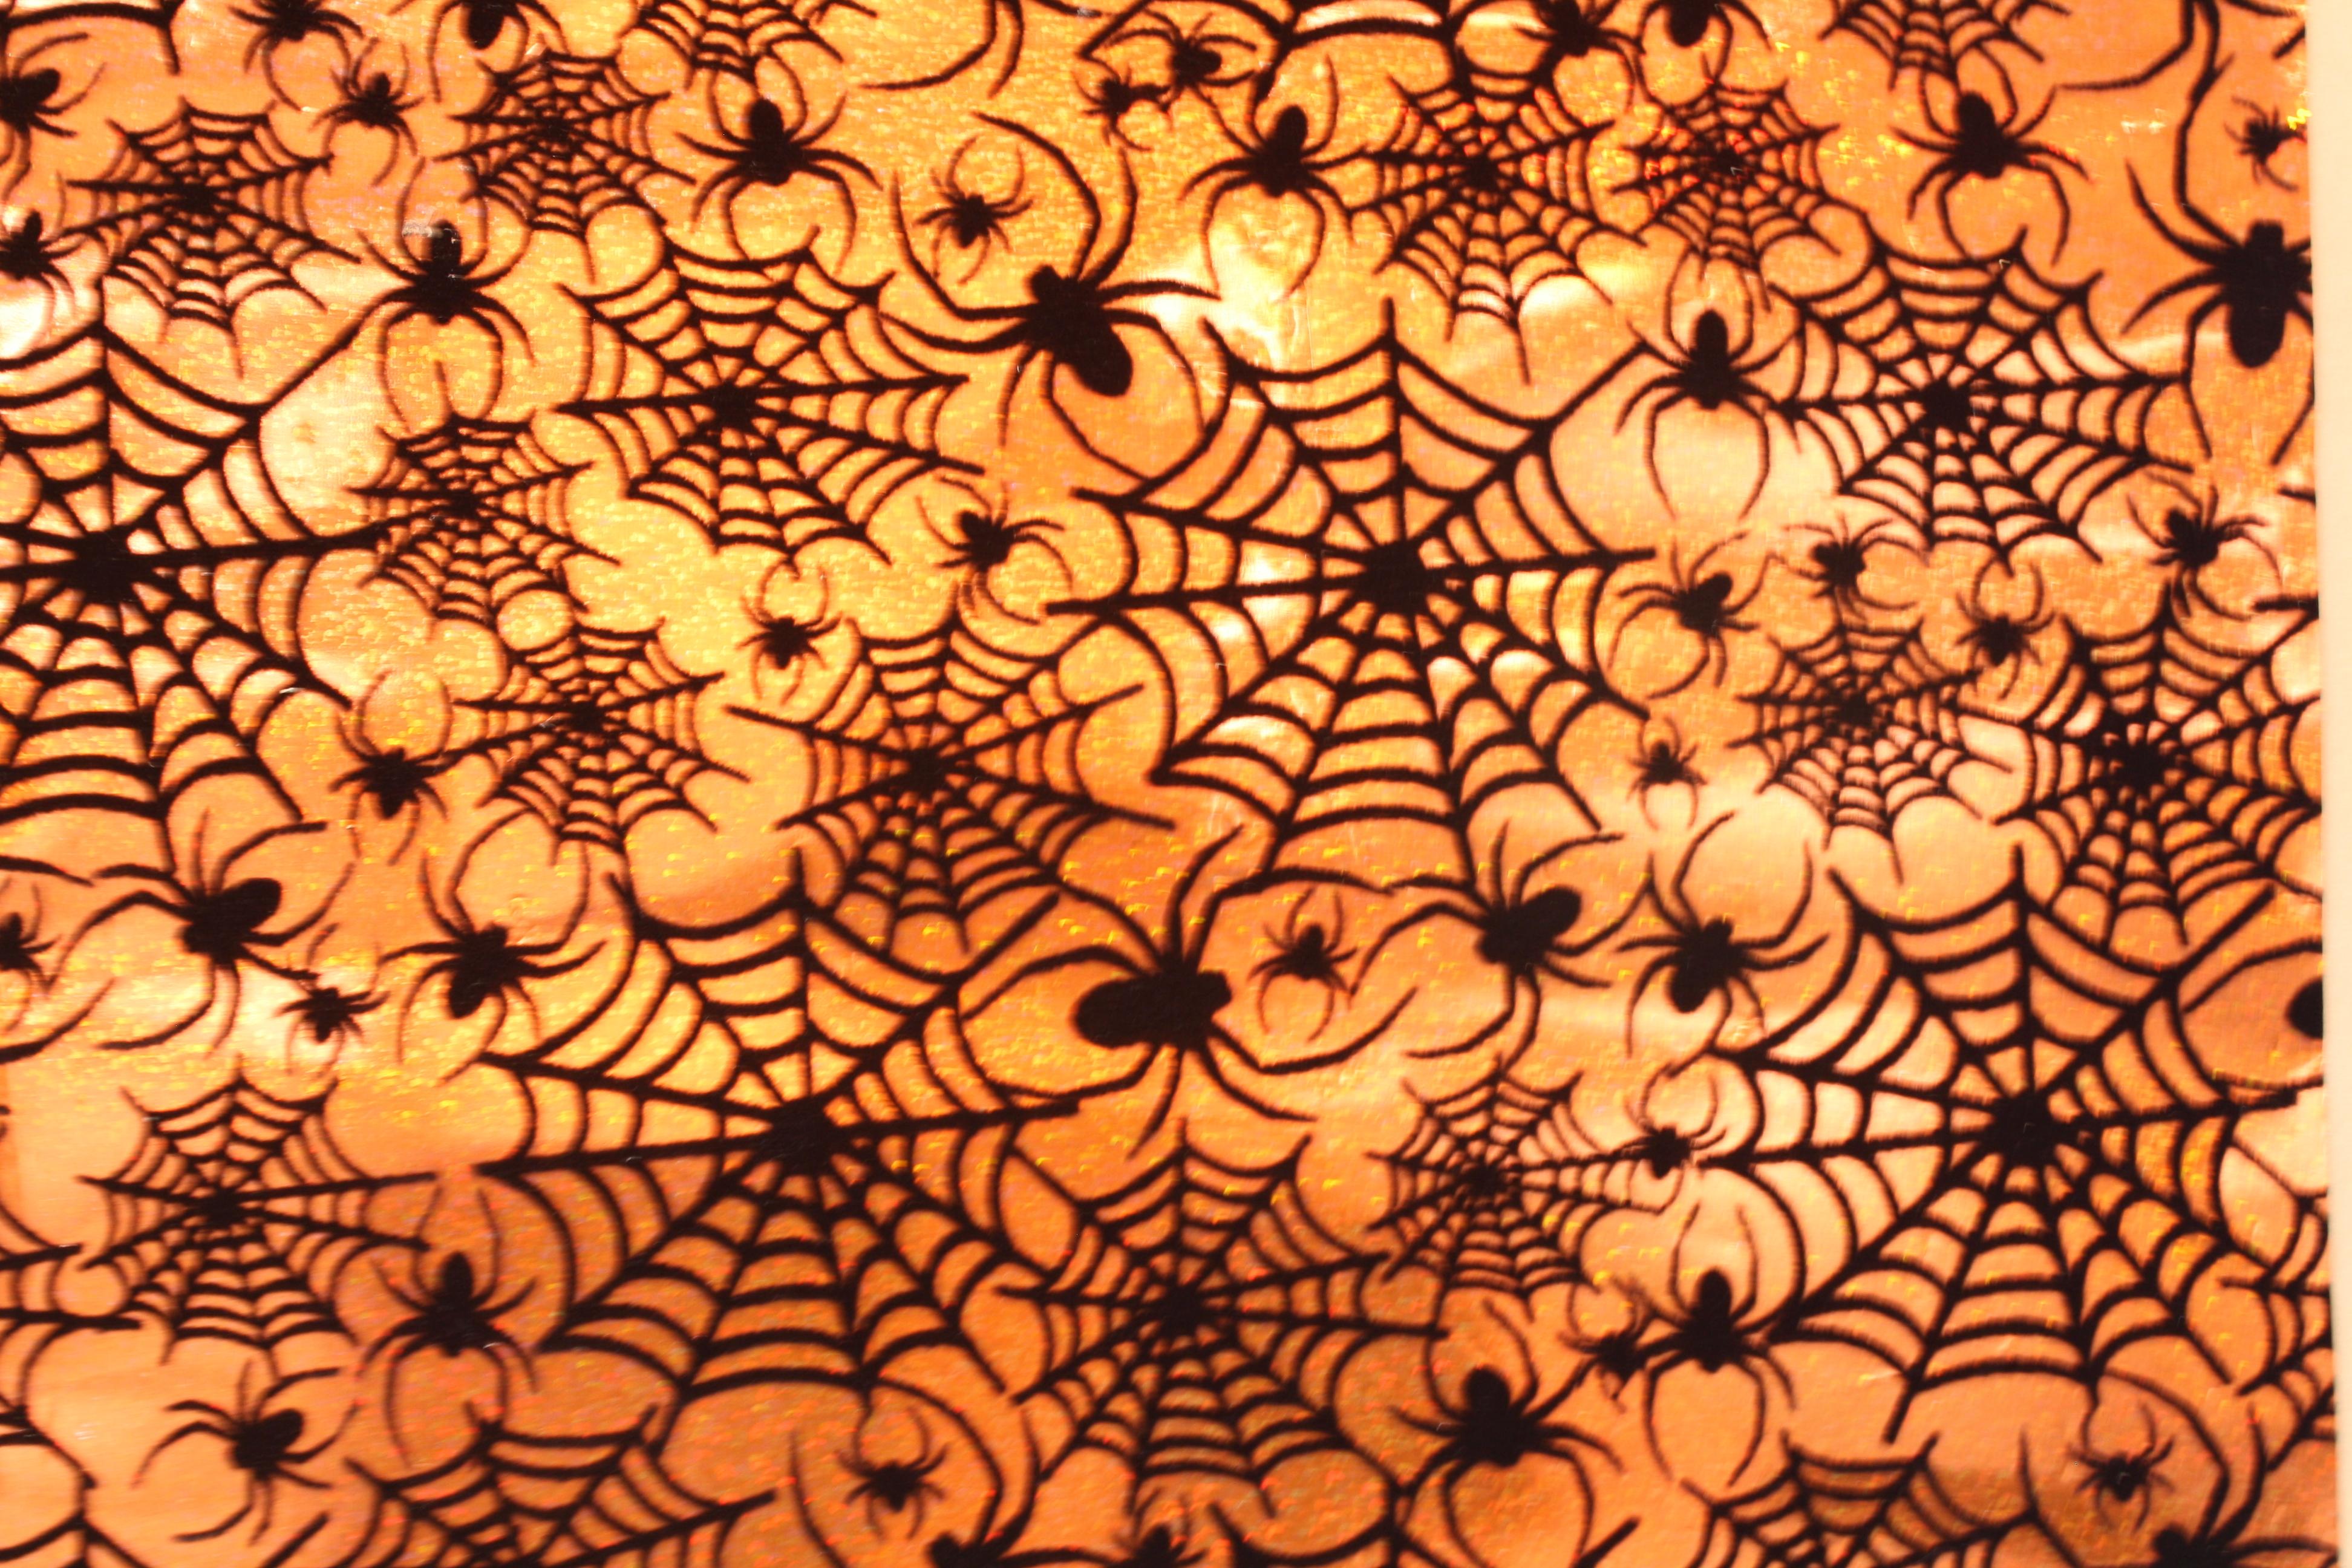 SPIDER WEB FLOCK PRINT